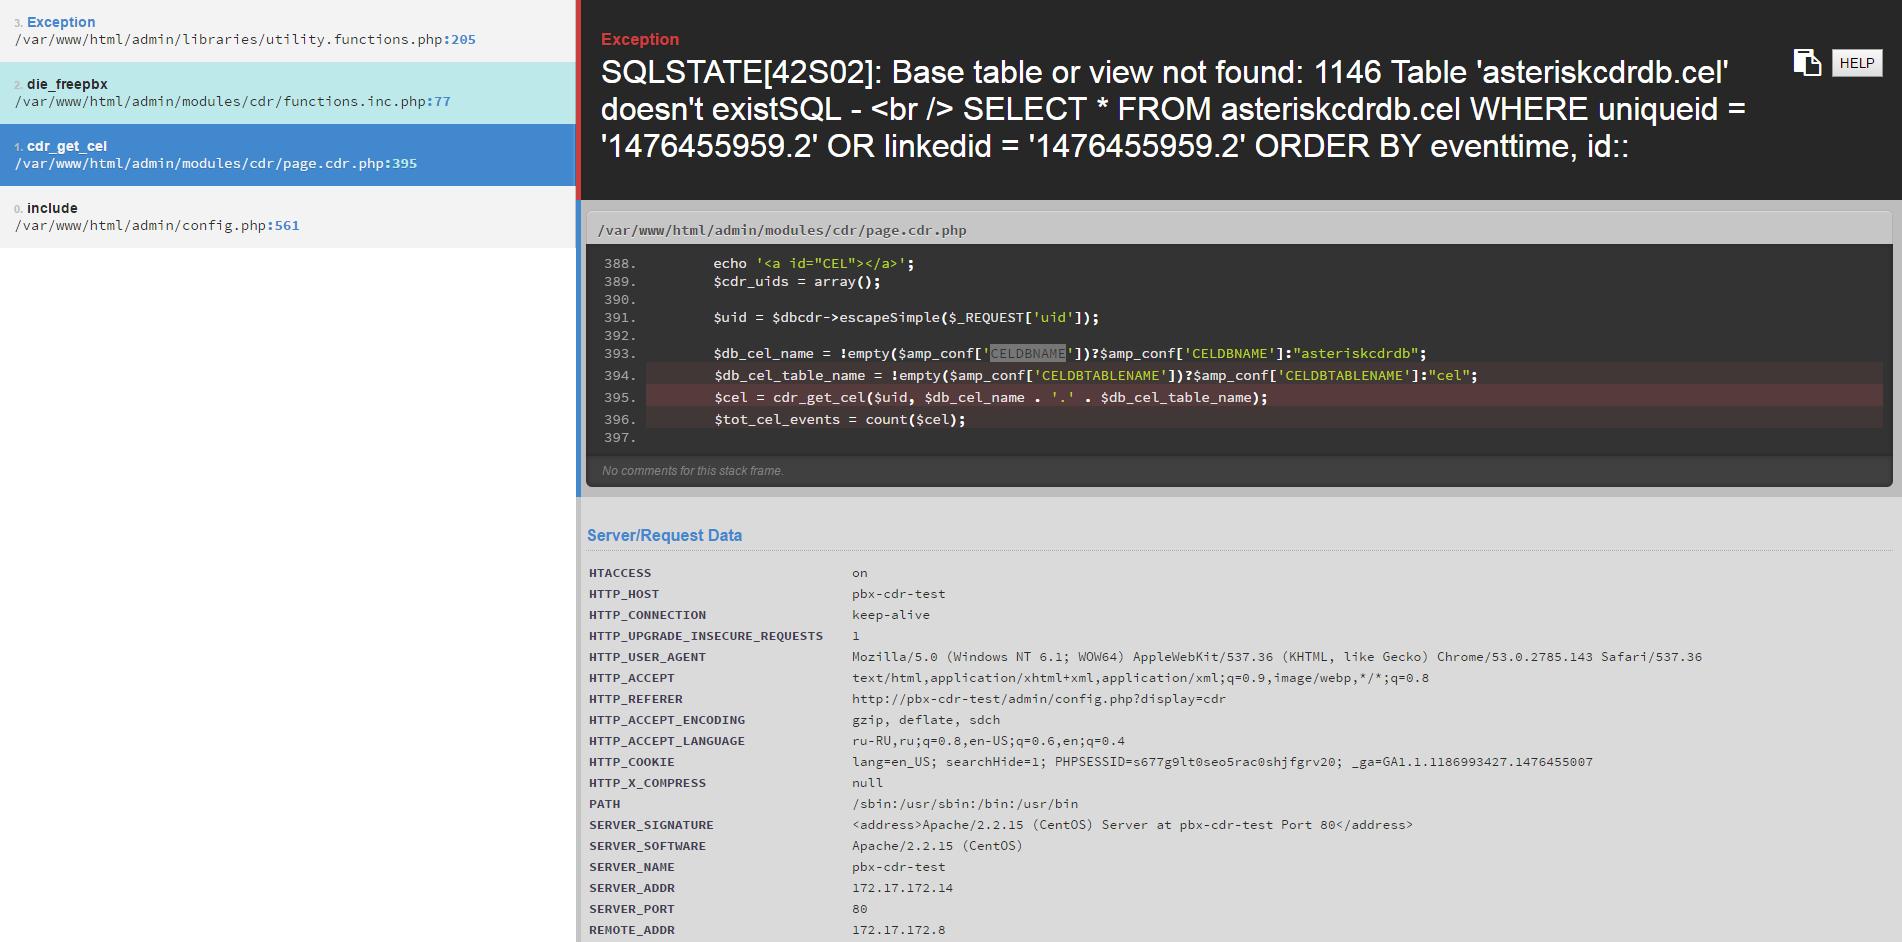 FREEPBX-13360] Missing configuration option for CELDBNAME variable